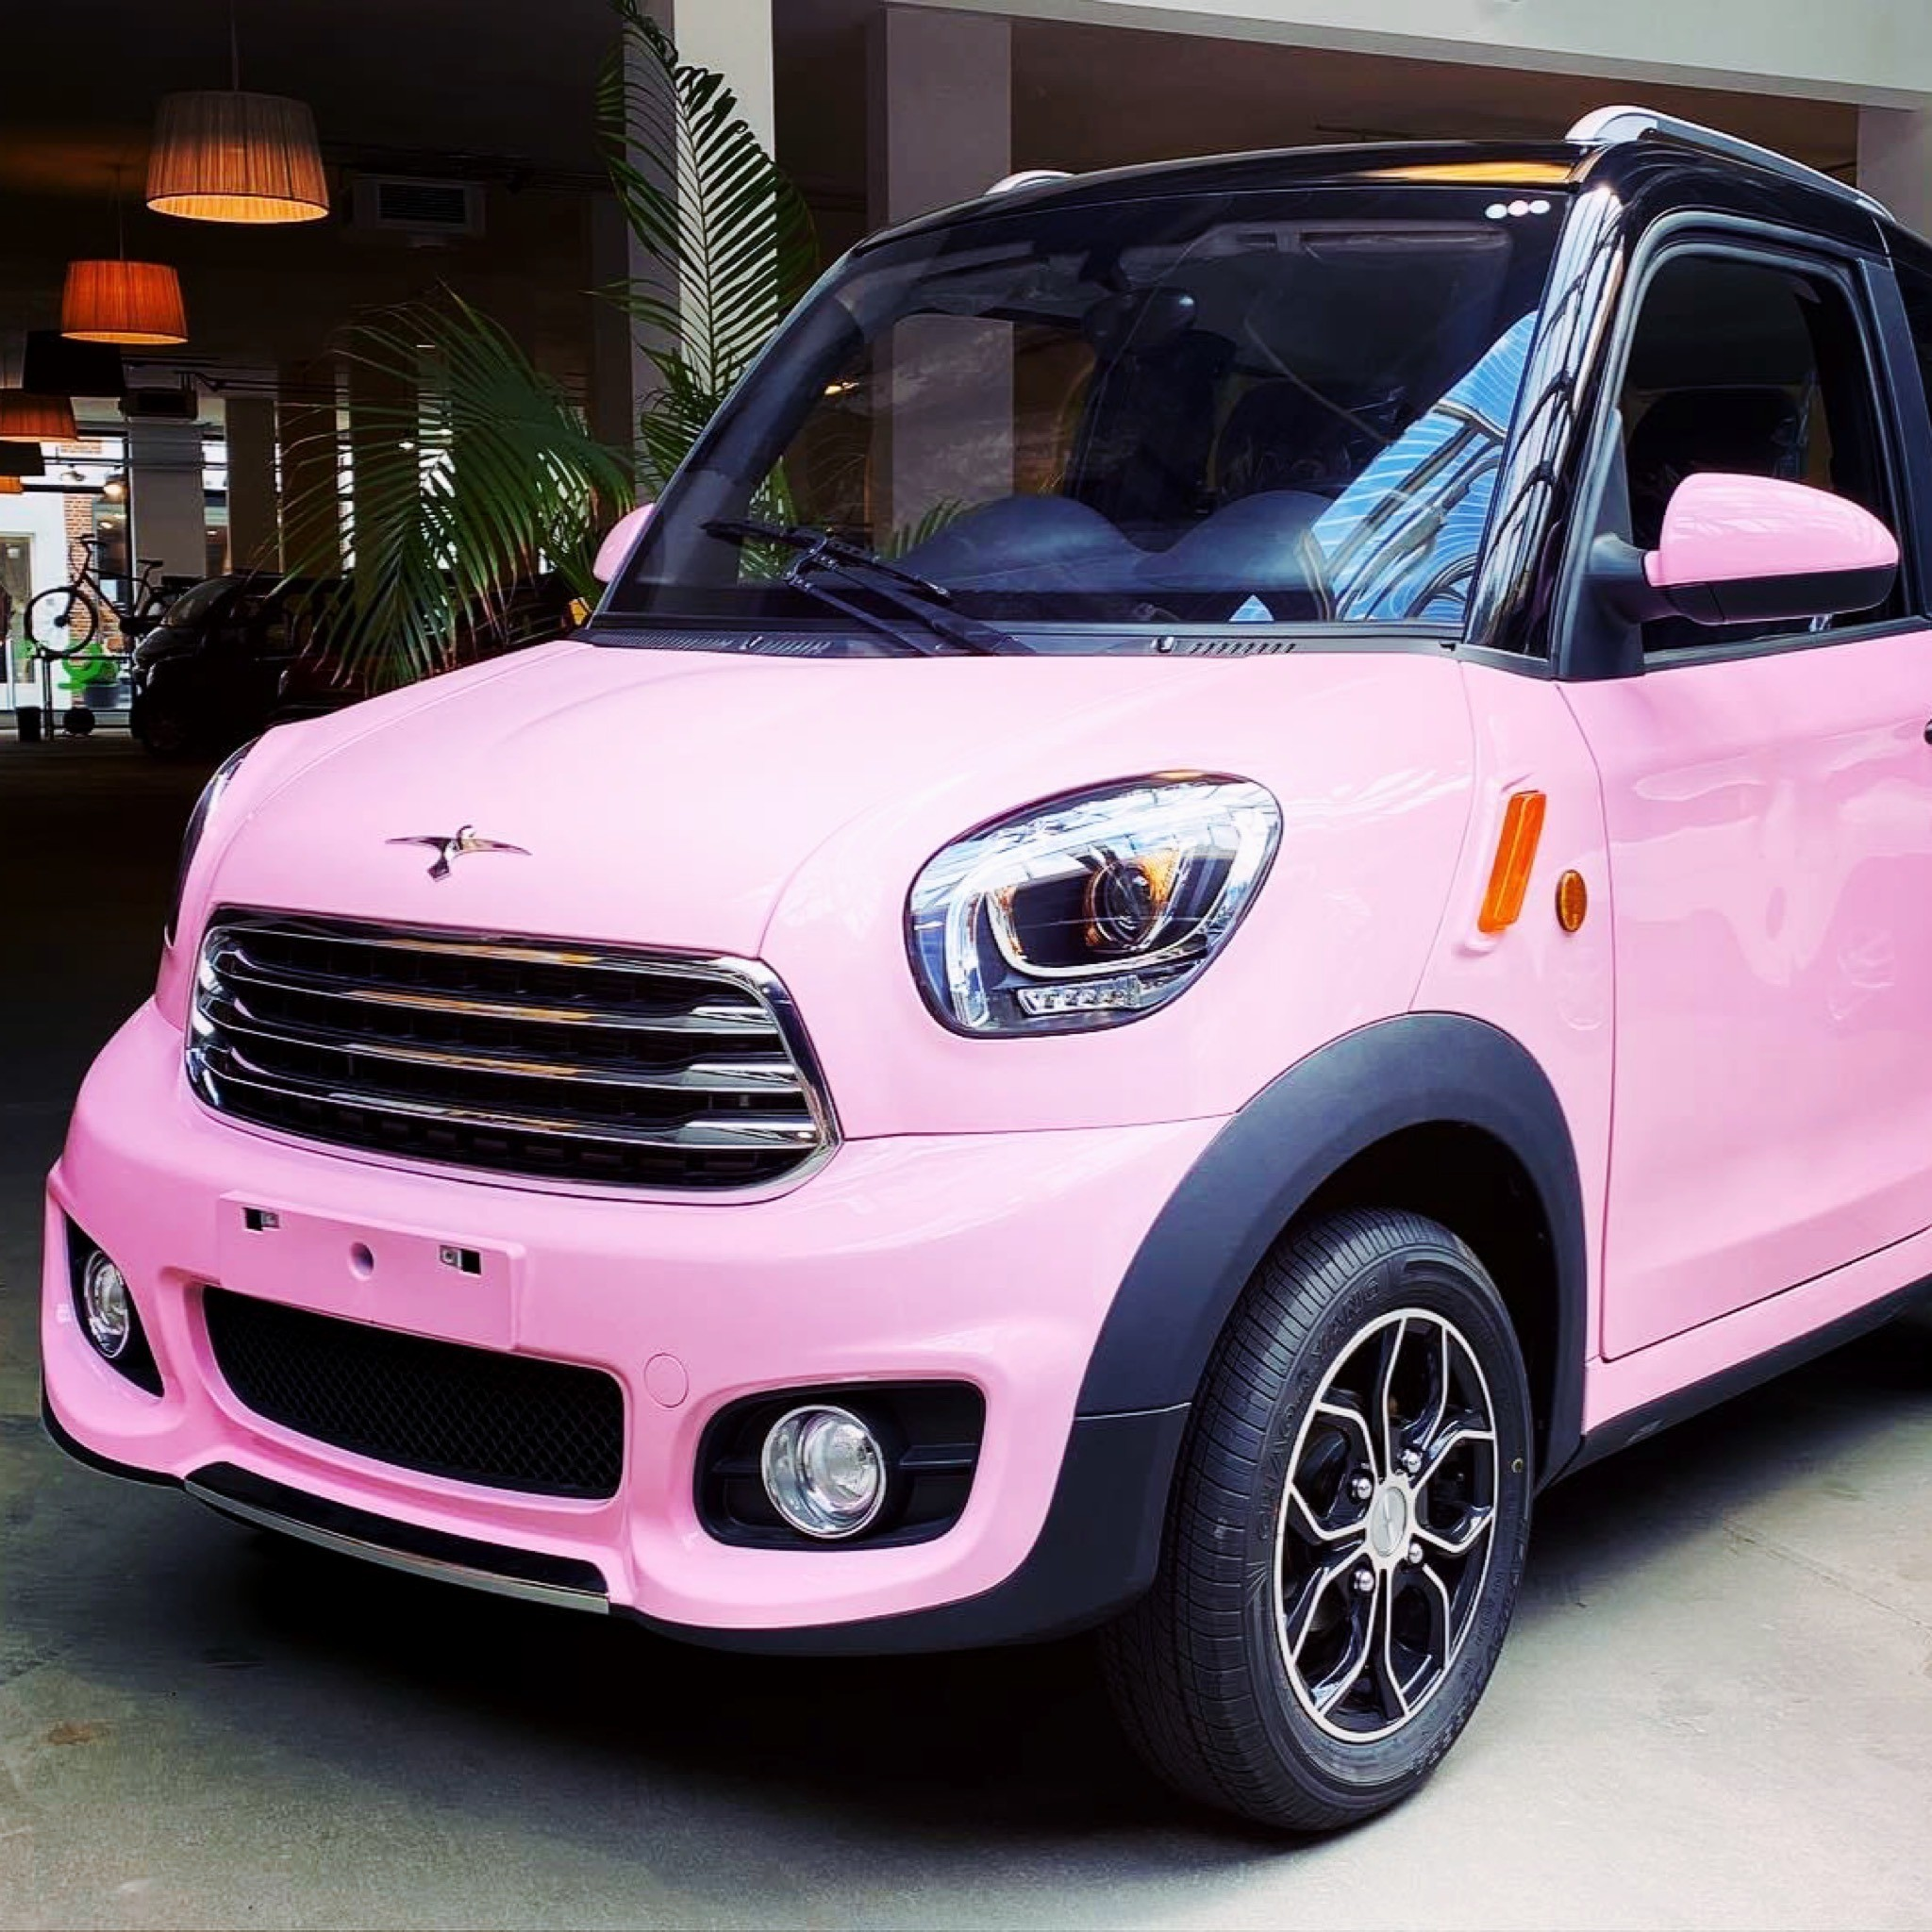 Flinc-EV acties electric vehicles